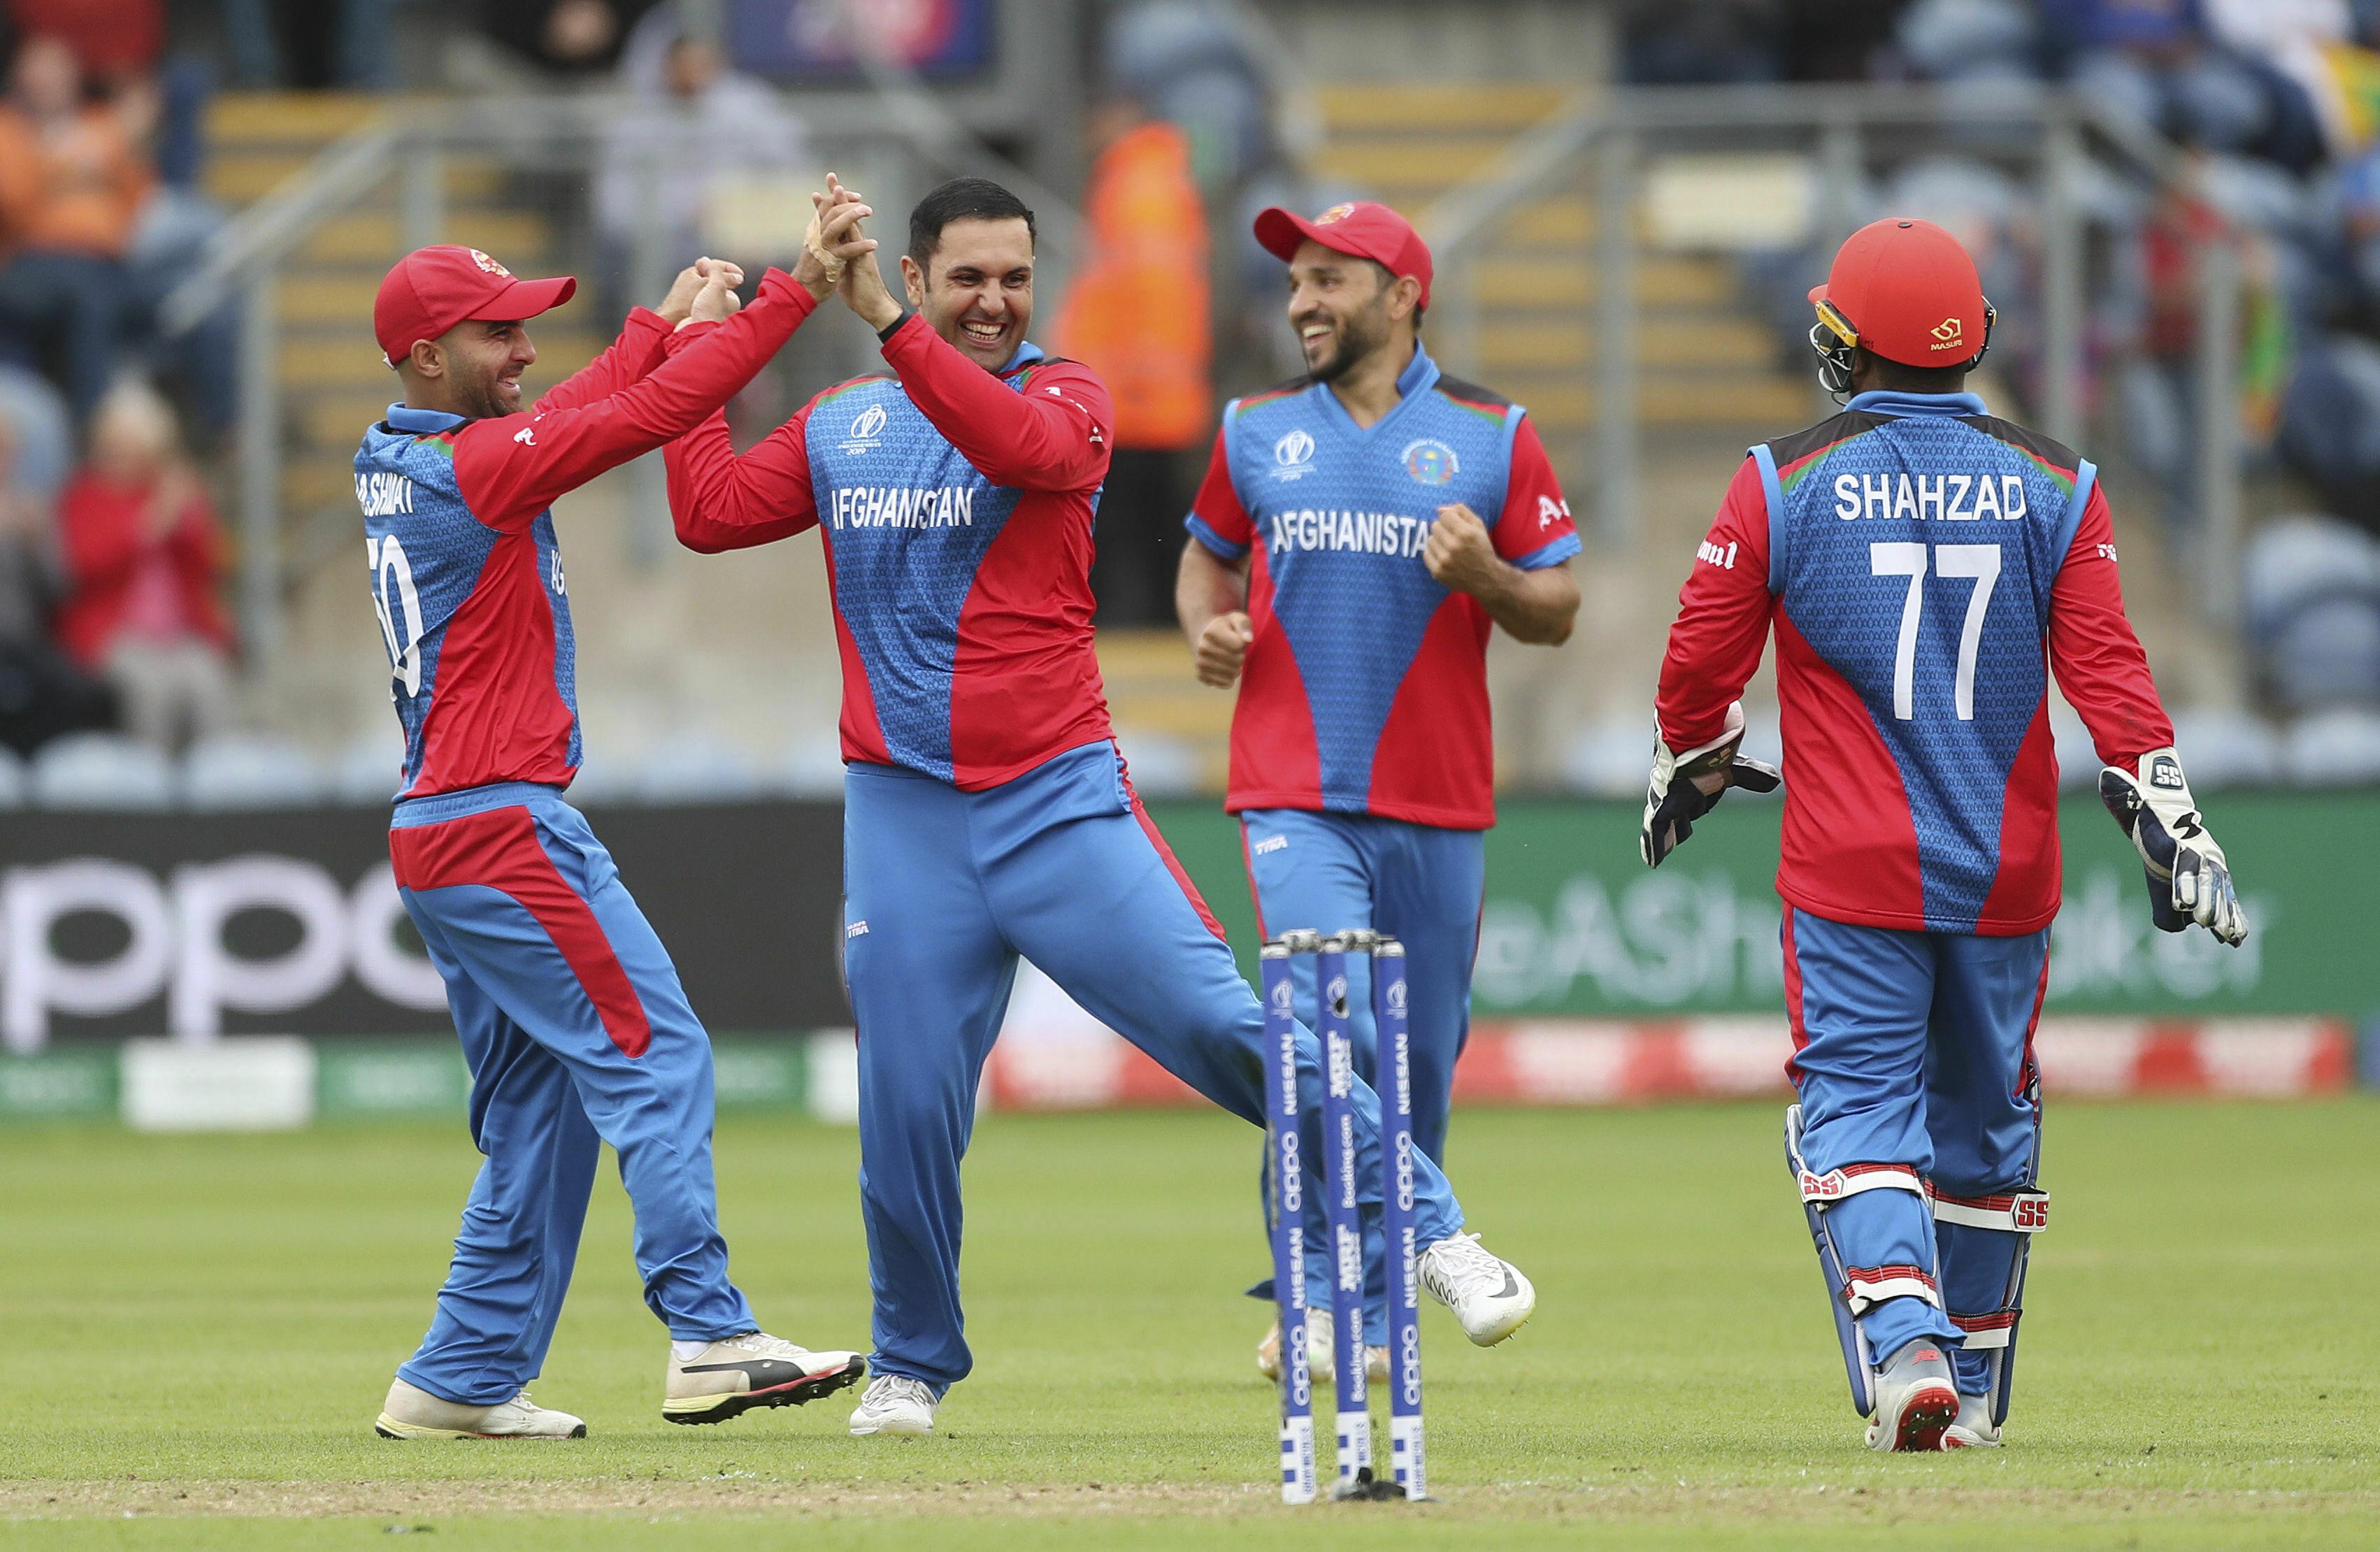 Afghanistan's Mohammad Nabi celebrates taking the wicket of Sri Lanka's Kusal Mendis at the Cardiff Stadium, Wales, on June 4.